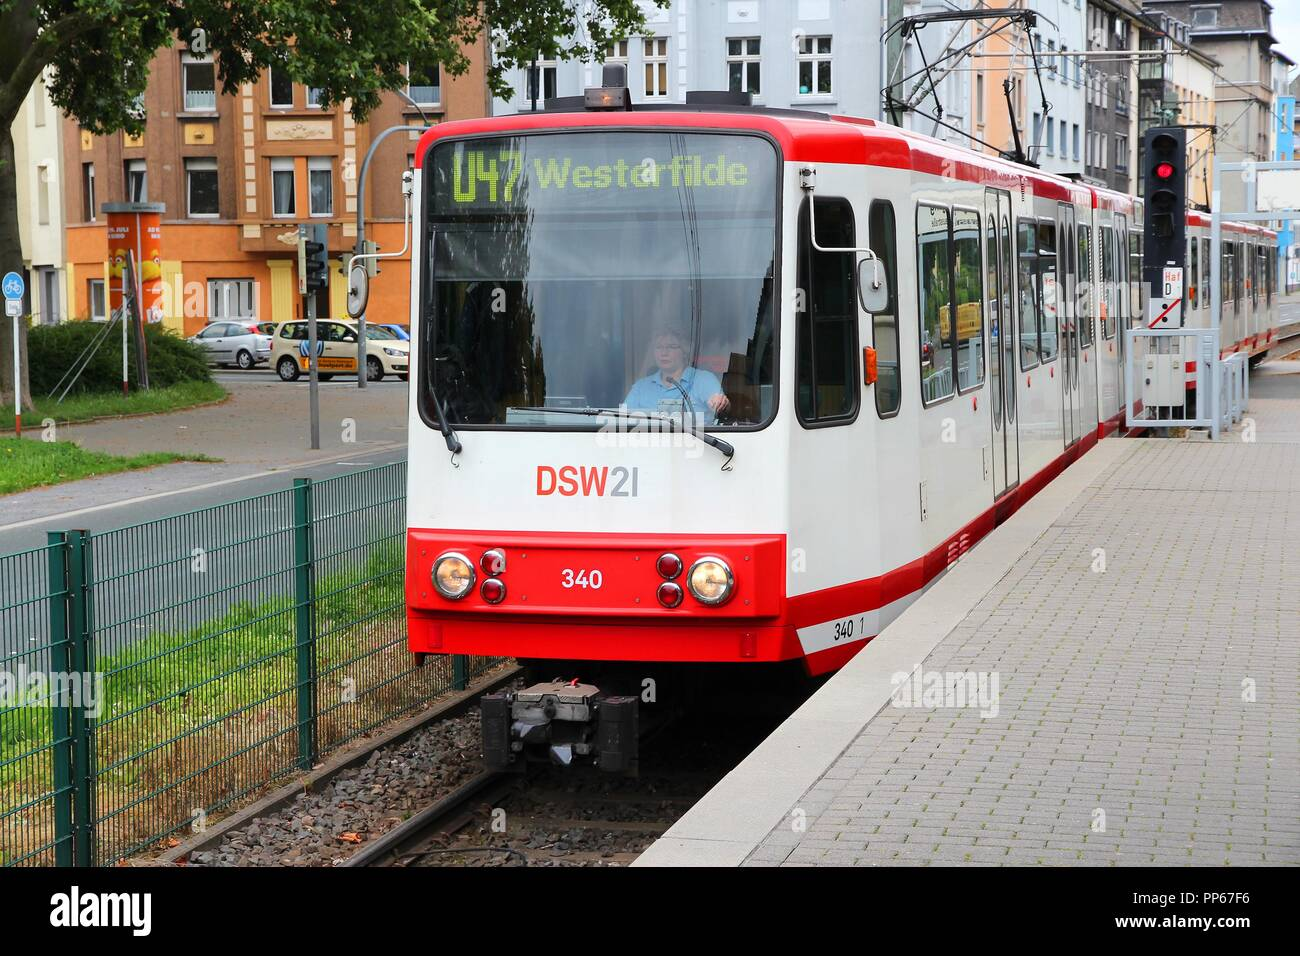 DORTMUND, GERMANY - JULY 16: People ride city tram on July 16, 2012 in  Dortmund, Germany. Dortmund light rail network serves 130 million annual  rides Stock Photo - Alamy